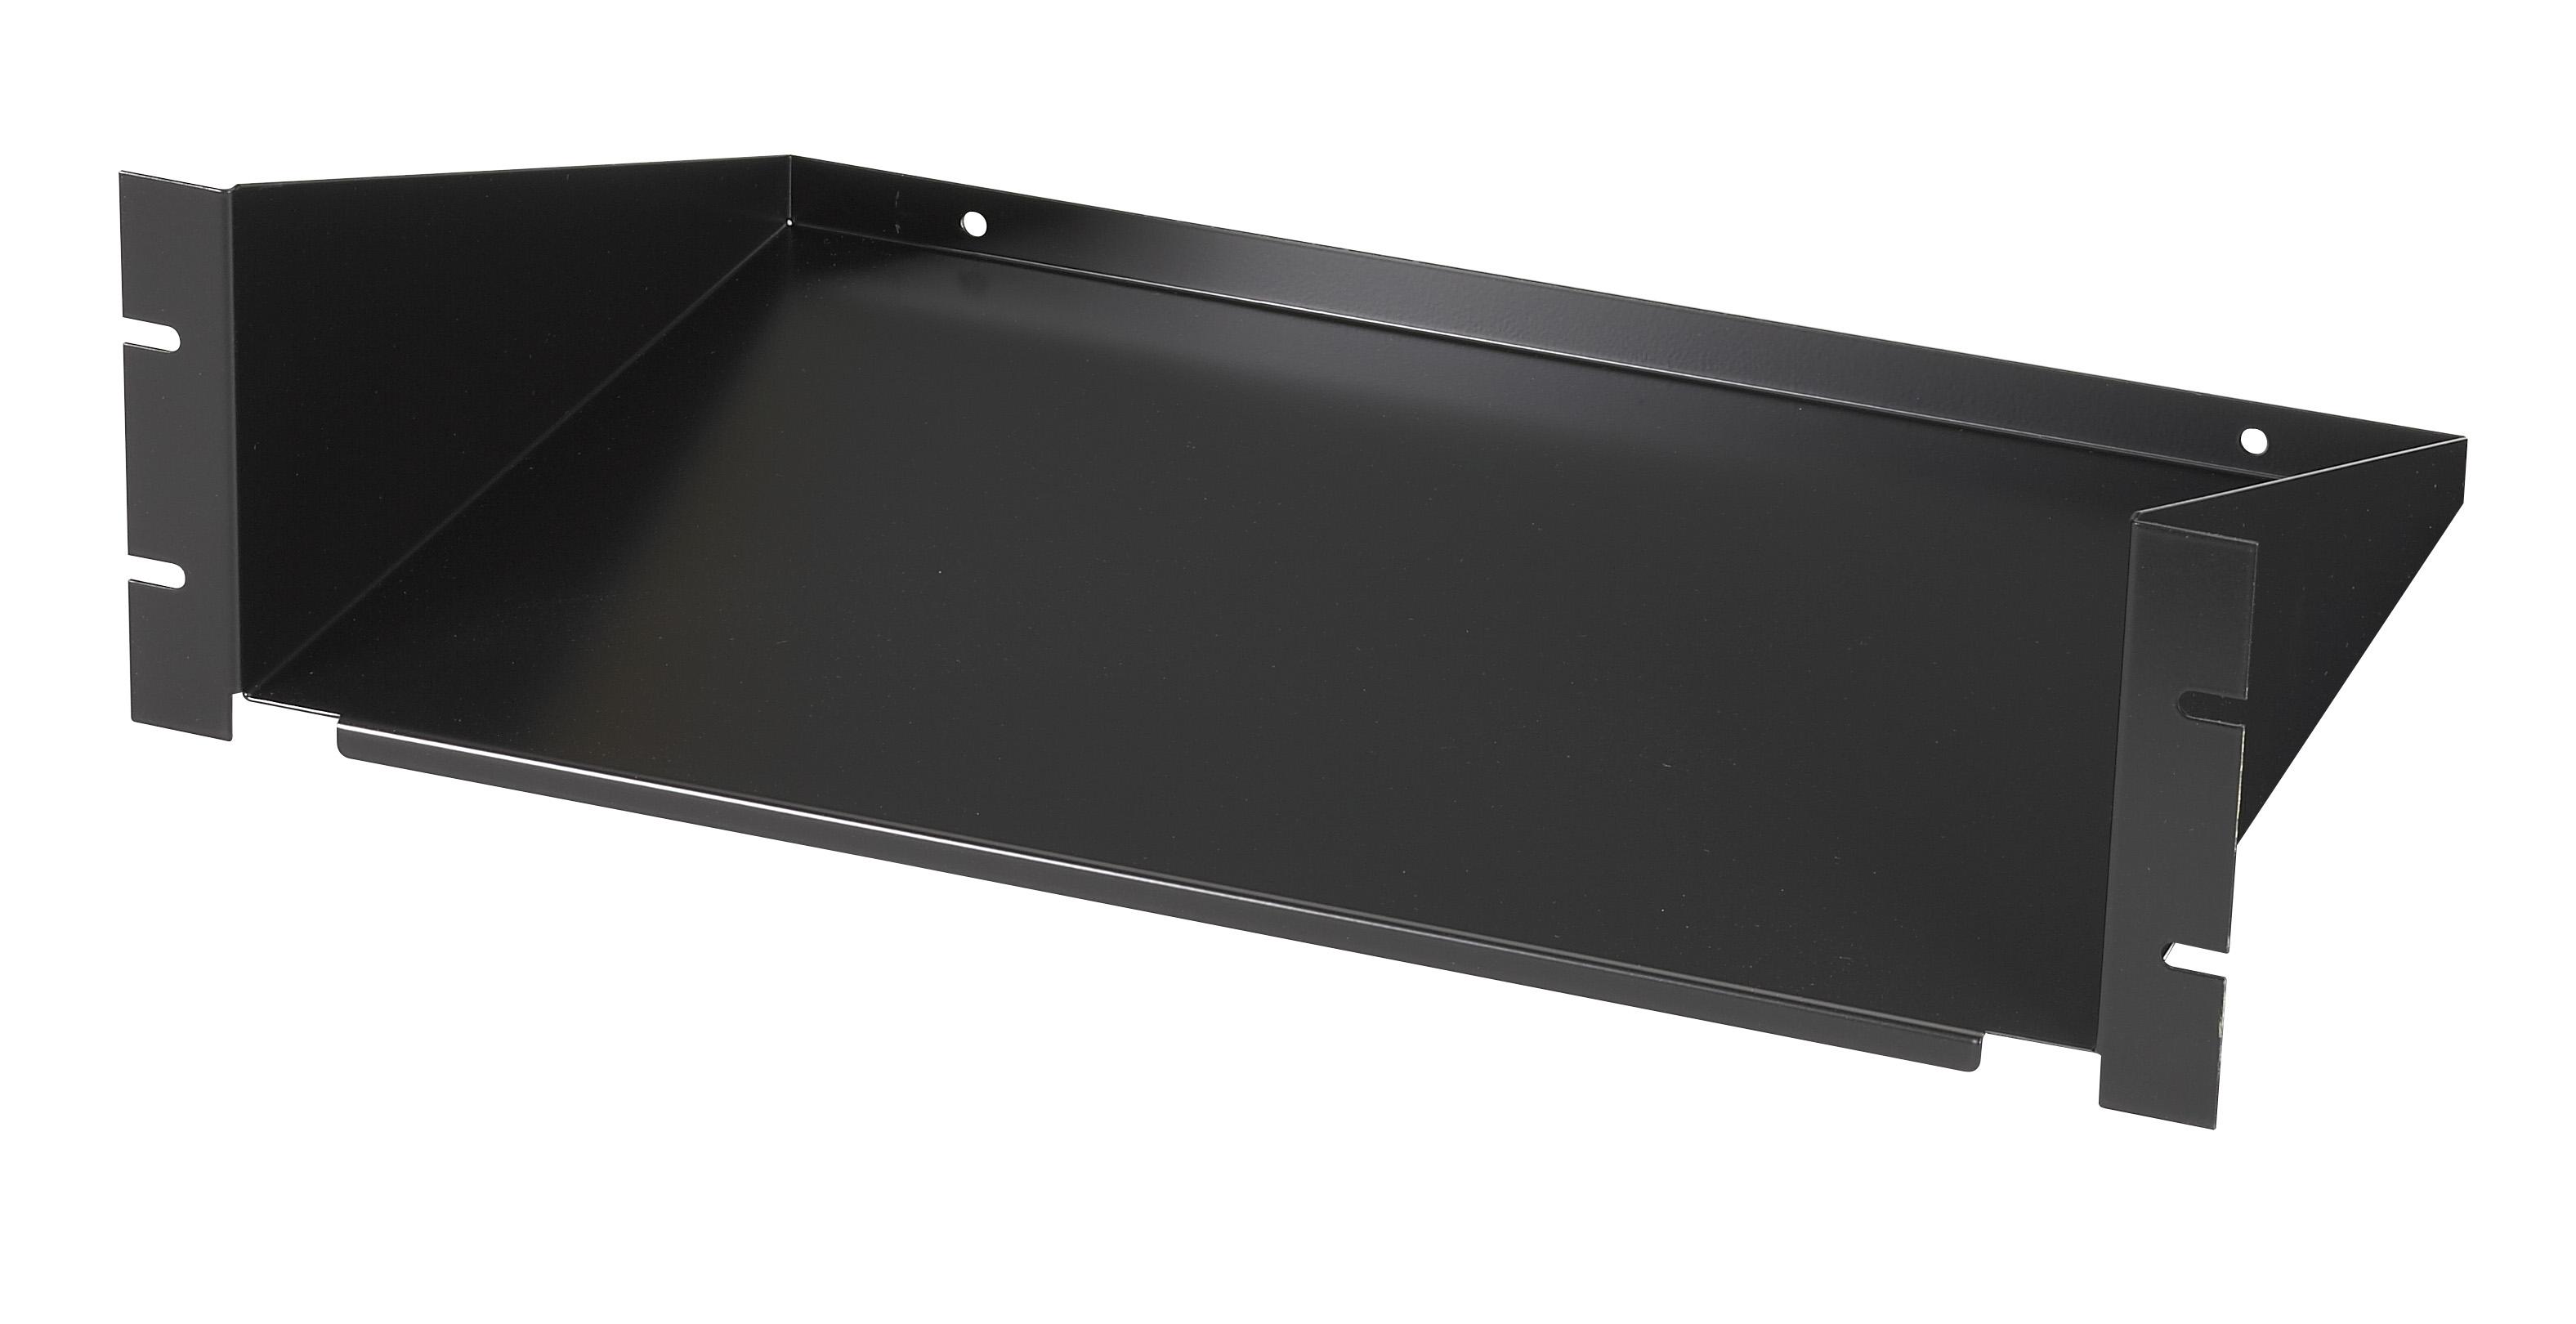 shelf inch mount universal amazon com design startech cantilever rack dp vented